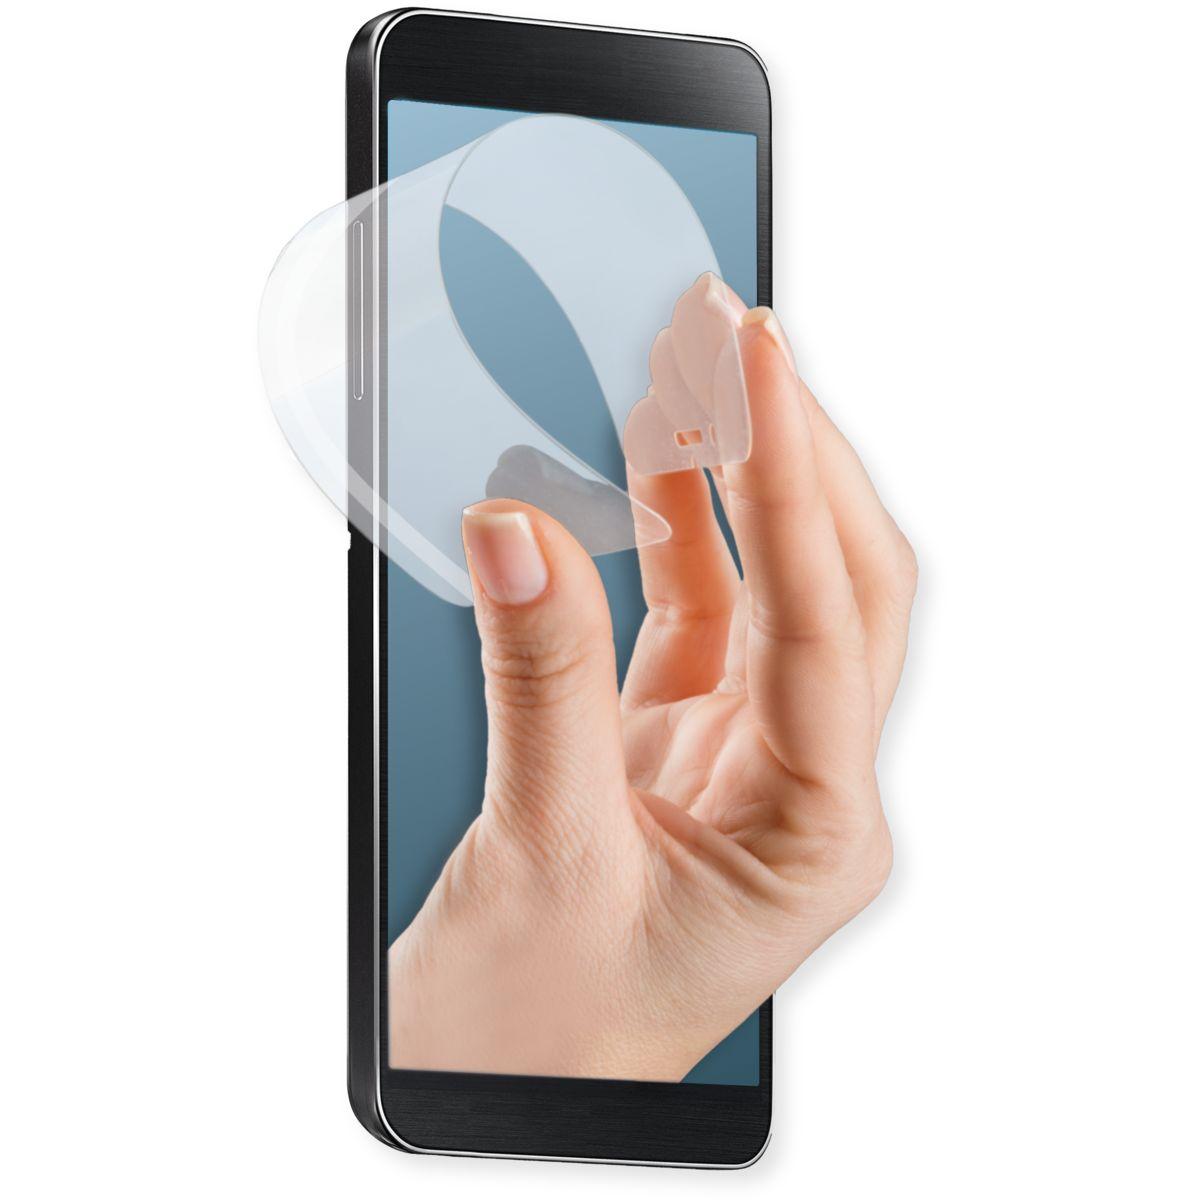 4Smarts Folie »Hybrid Flex-Glass Screen Protector iPhone 6«